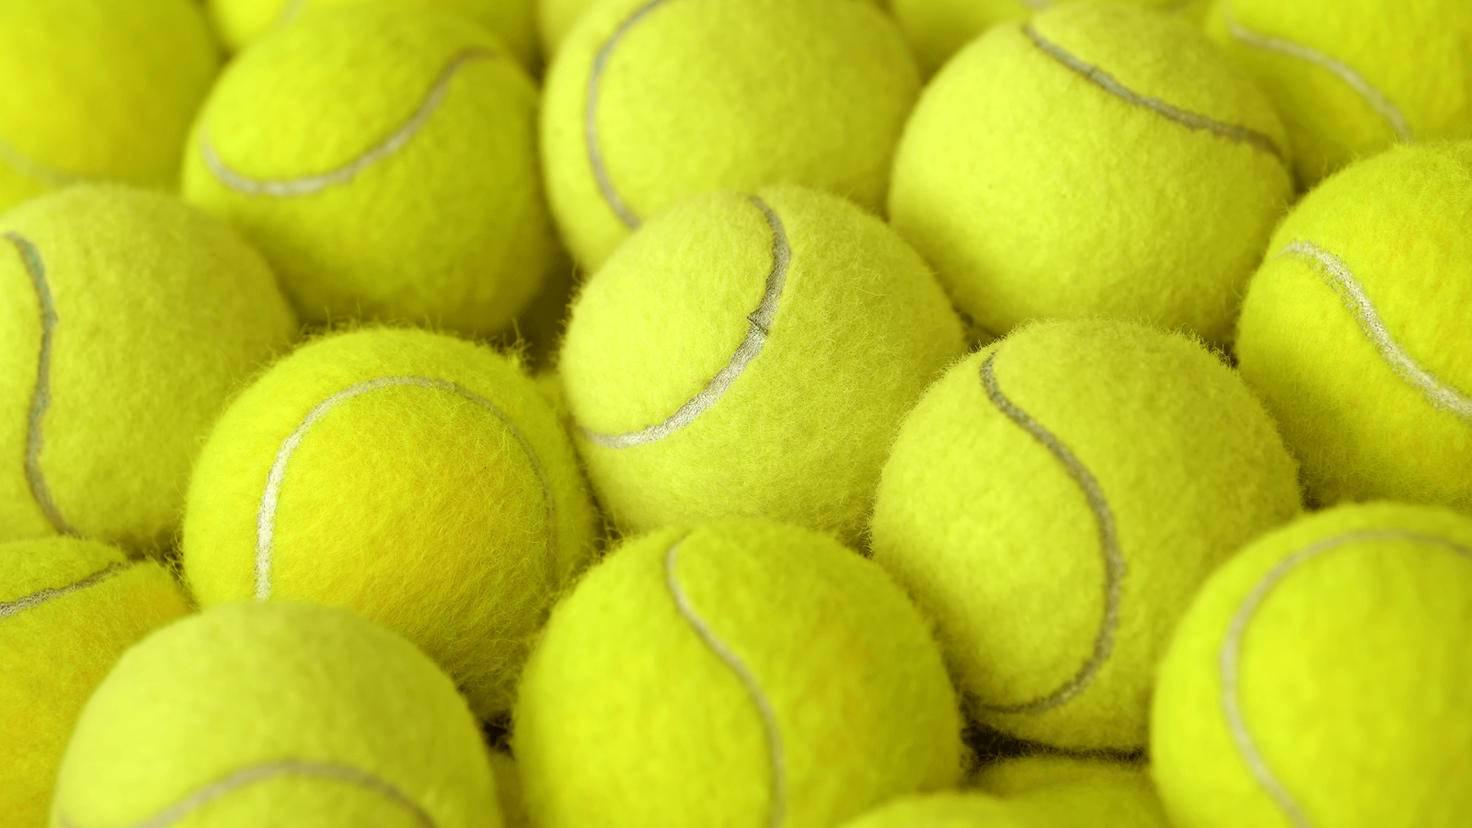 Tennisball-leisuretime70-AdobeStock_94972511